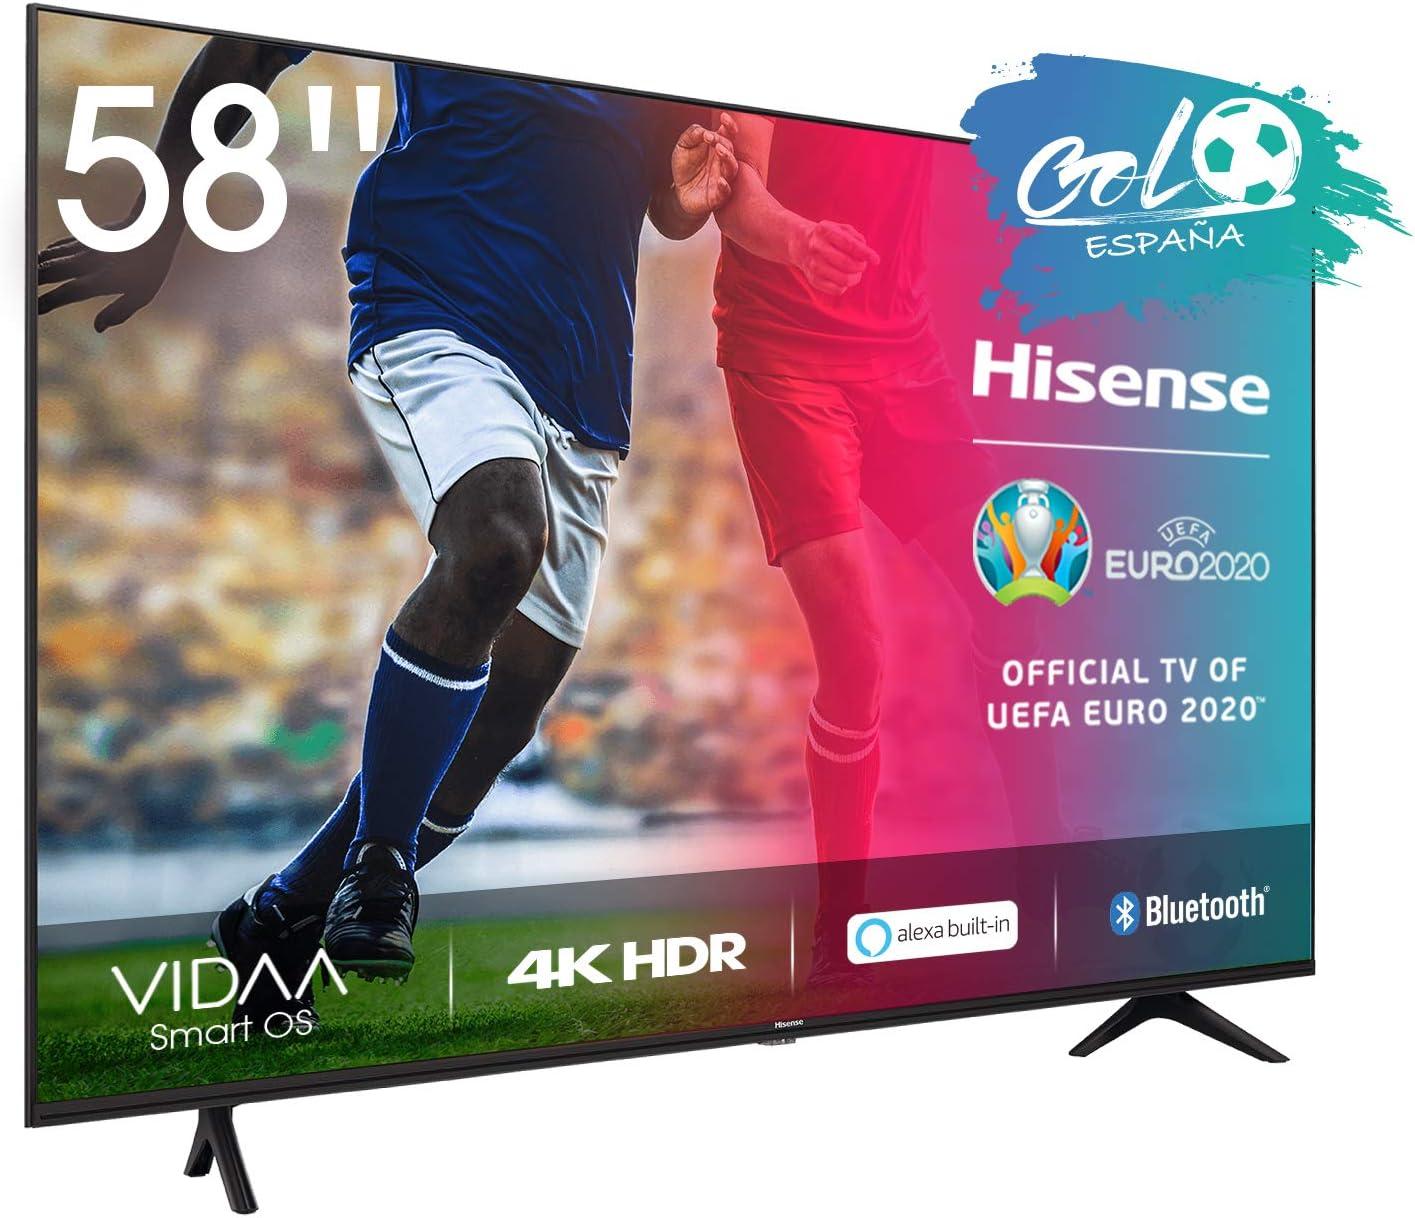 Hisense 58AE7000F - Smart TV Resolución 4K, UHD TV 2020, con Alexa integrada, Precision Colour, escalado UHD con IA, Ultra Dimming, audio DTS Studio Sound, Vidaa U 4.0: Amazon.es: Electrónica